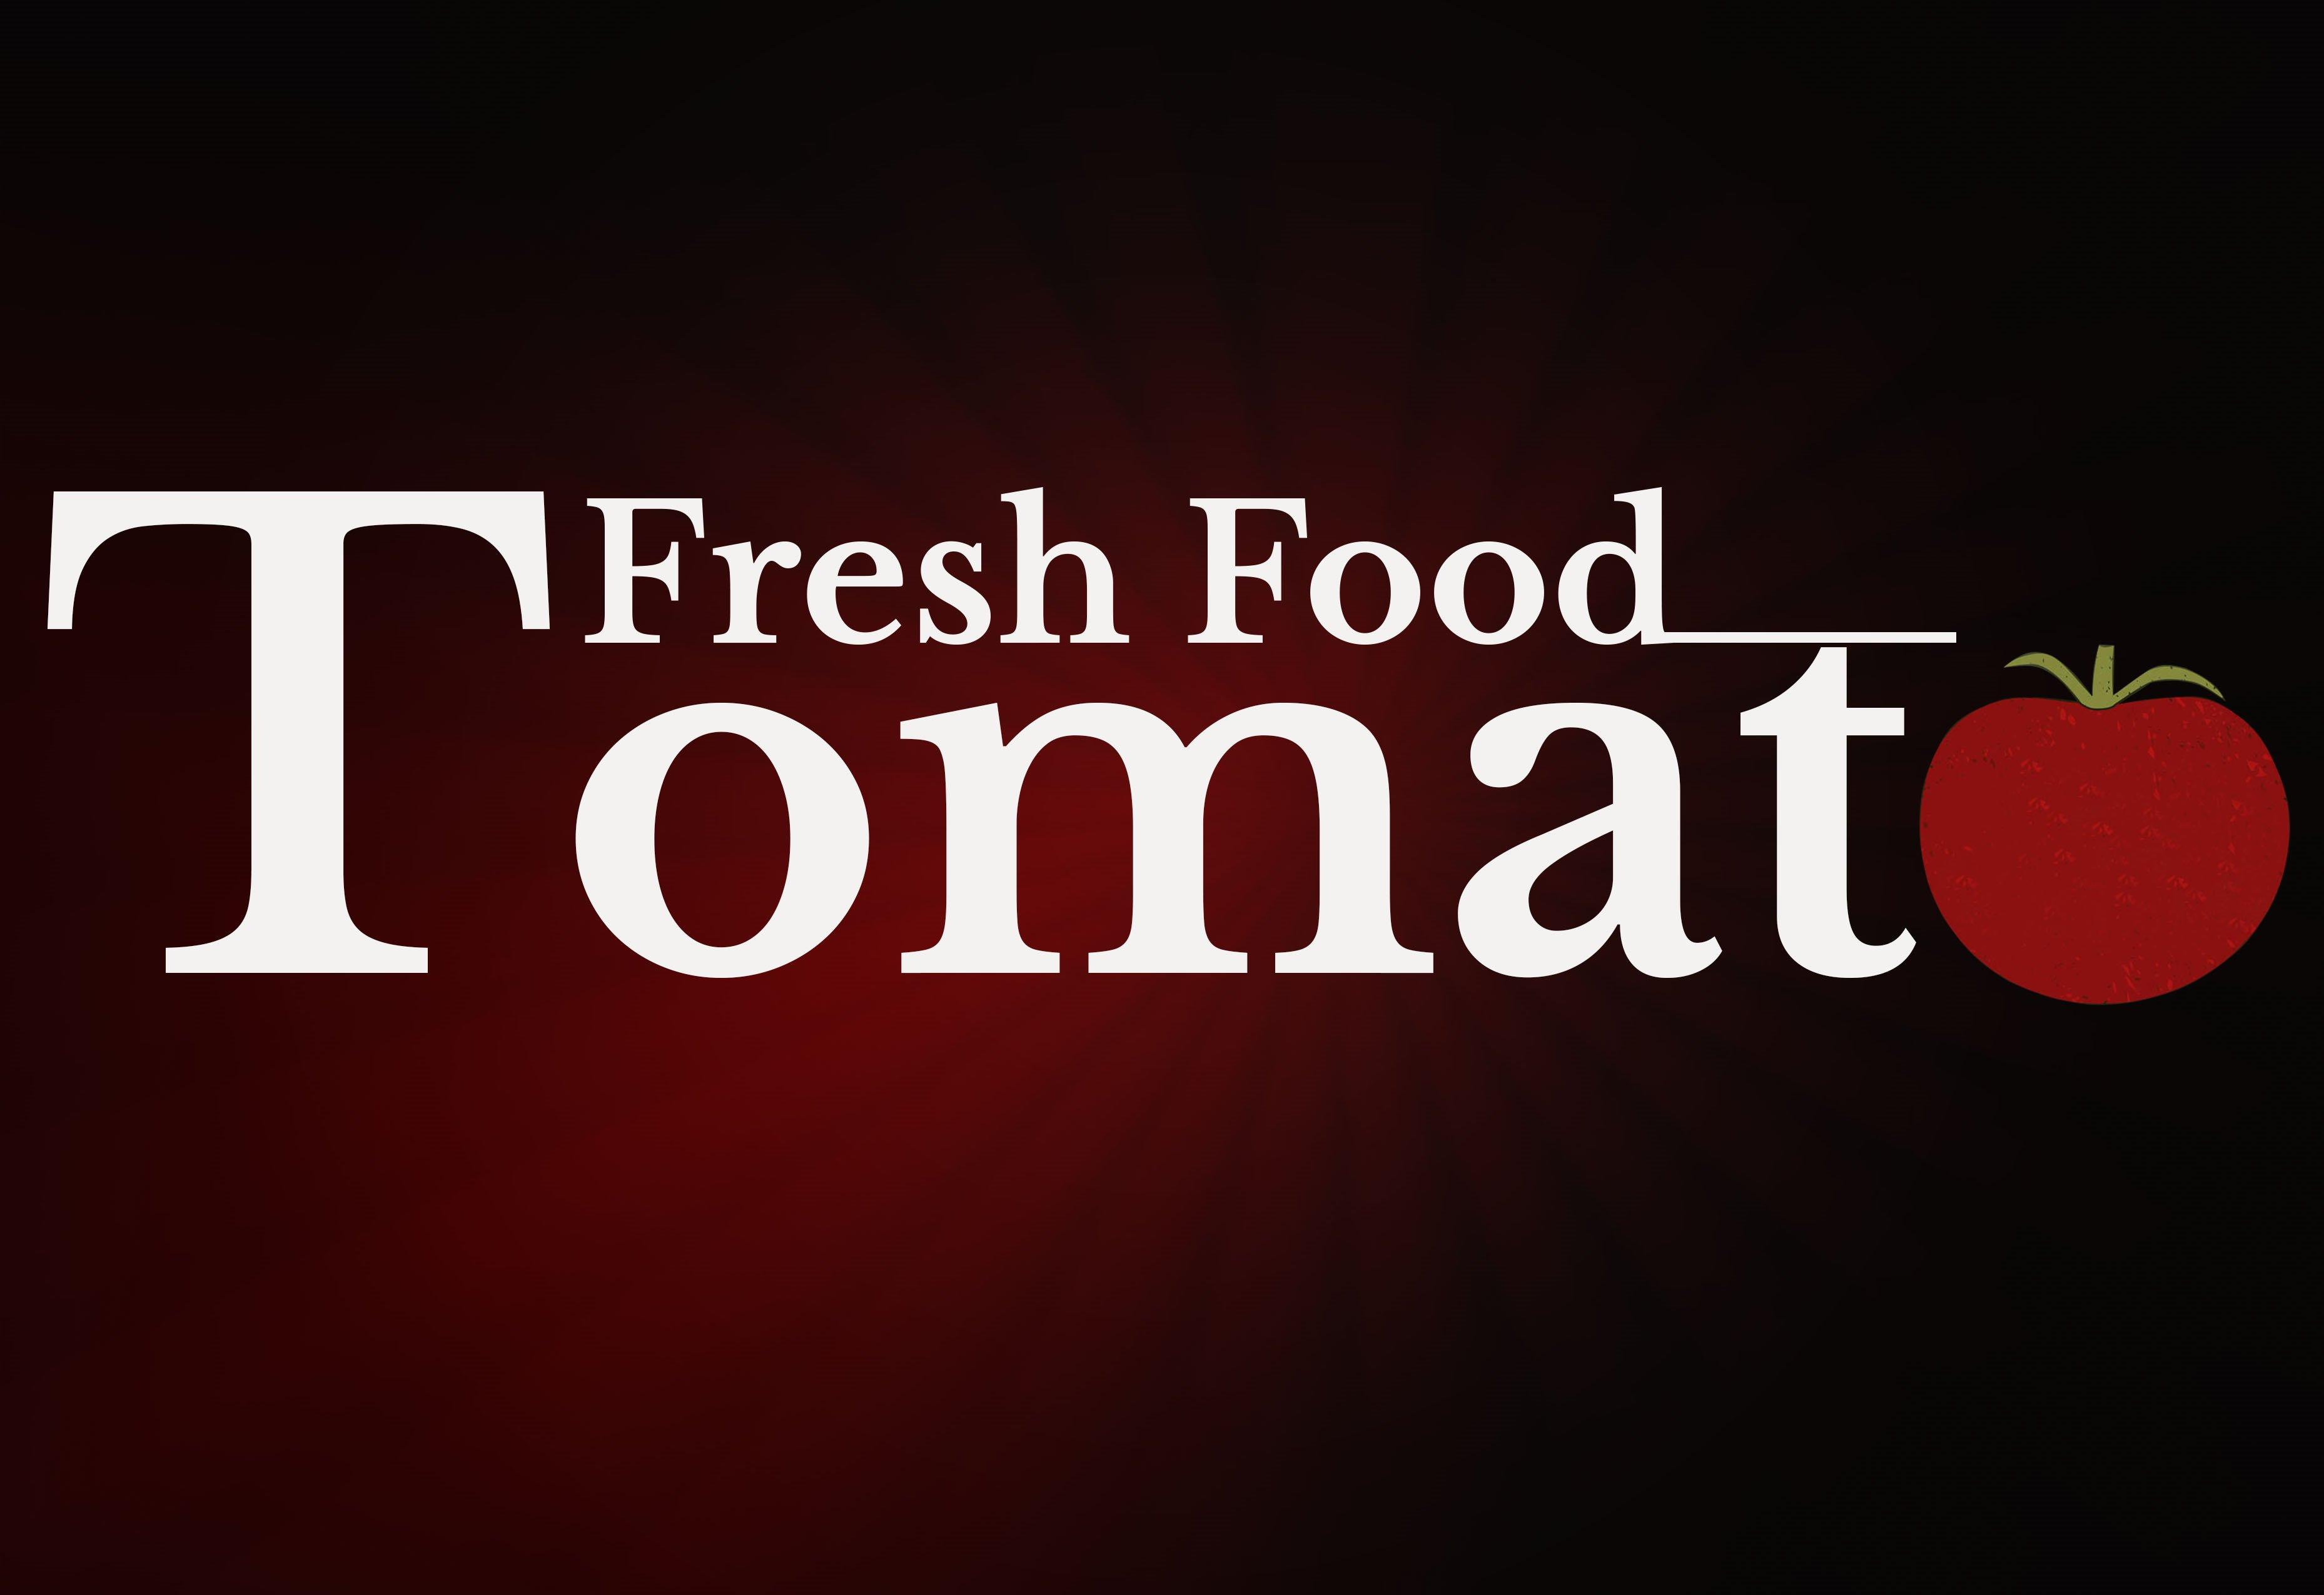 Tomato Fresh Food